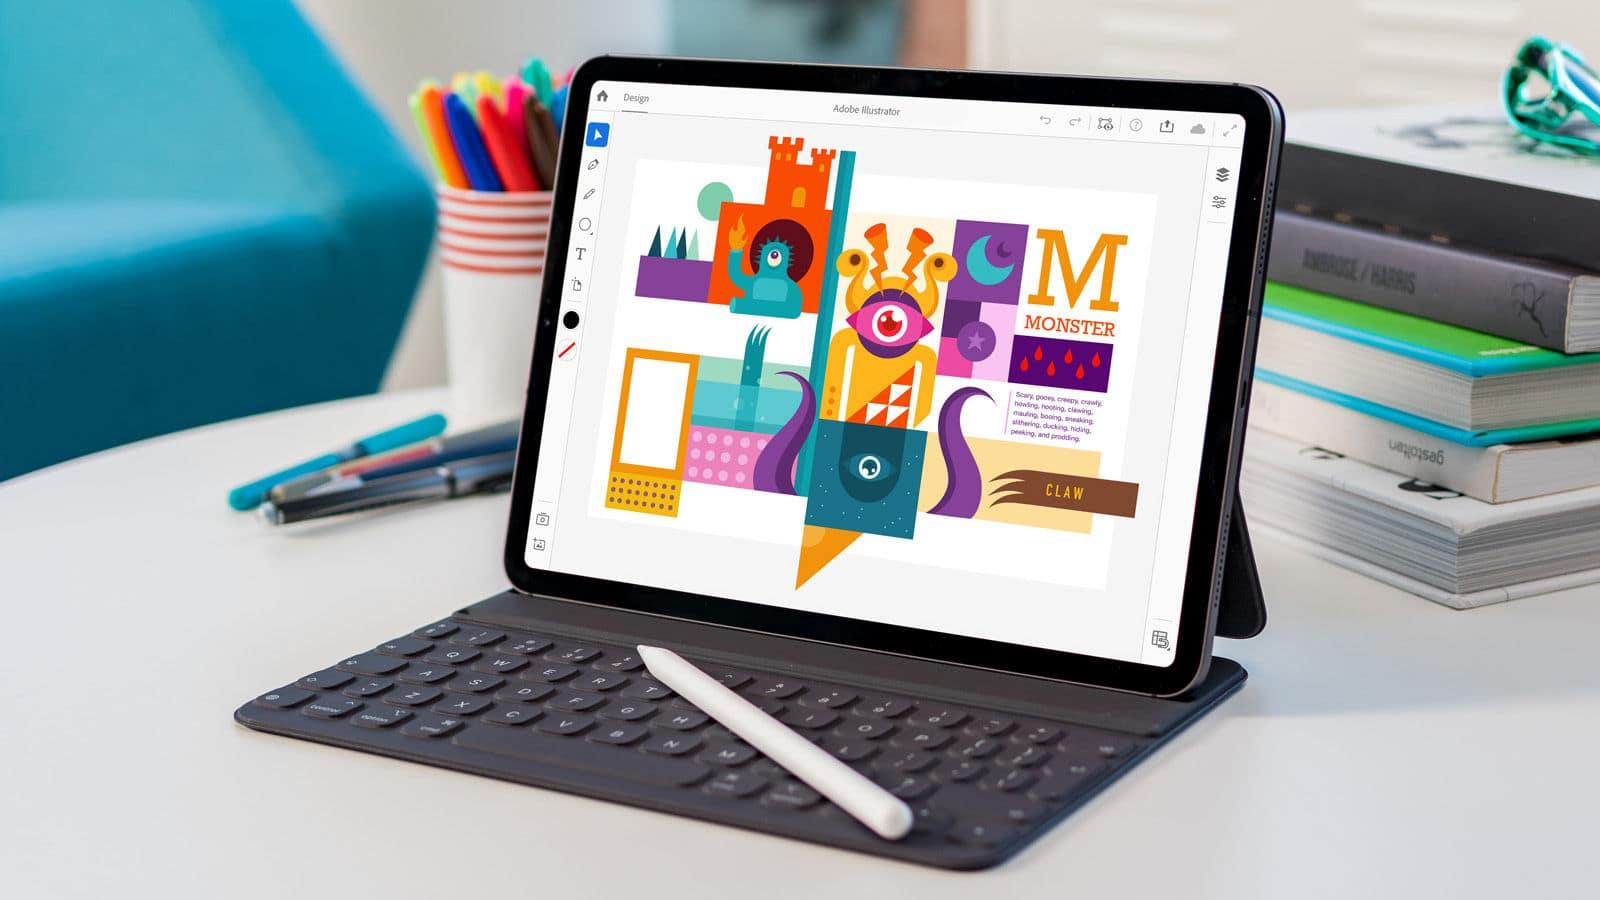 Adobe invites users to test beta version of Illustrator for iPad